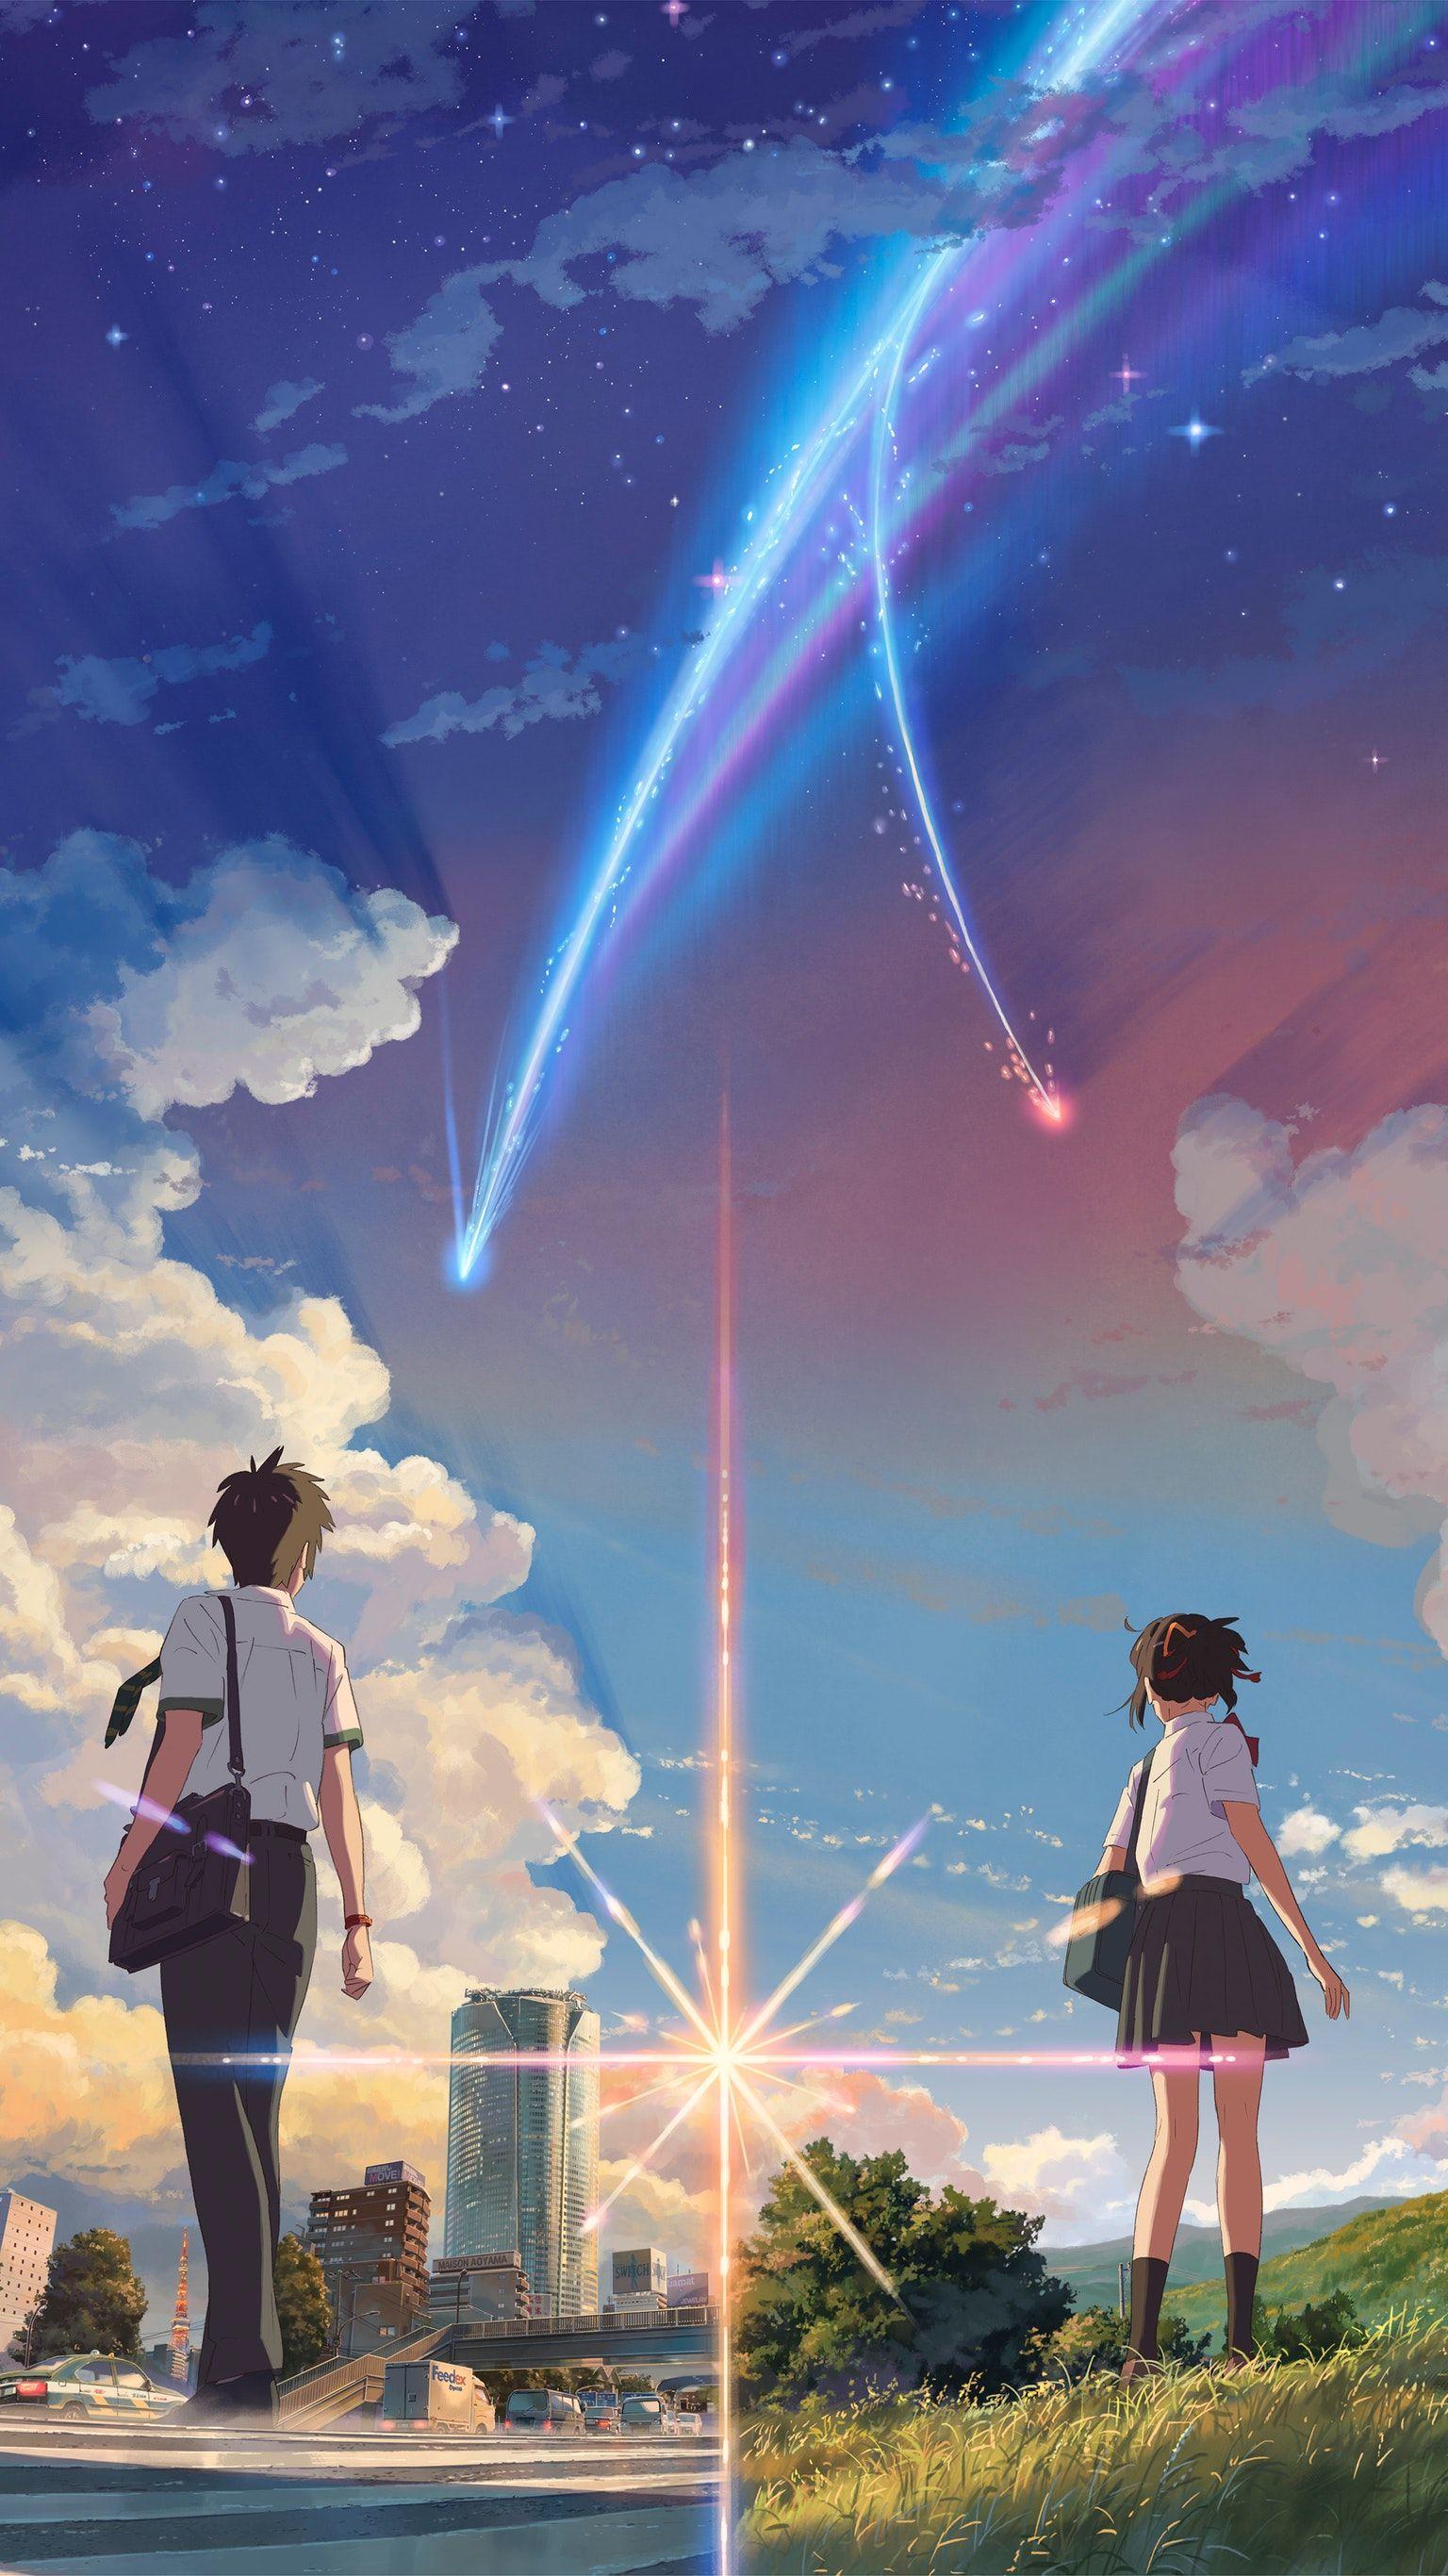 wallpaper for your phone,sky,anime,cloud,rainbow,meteorological phenomenon